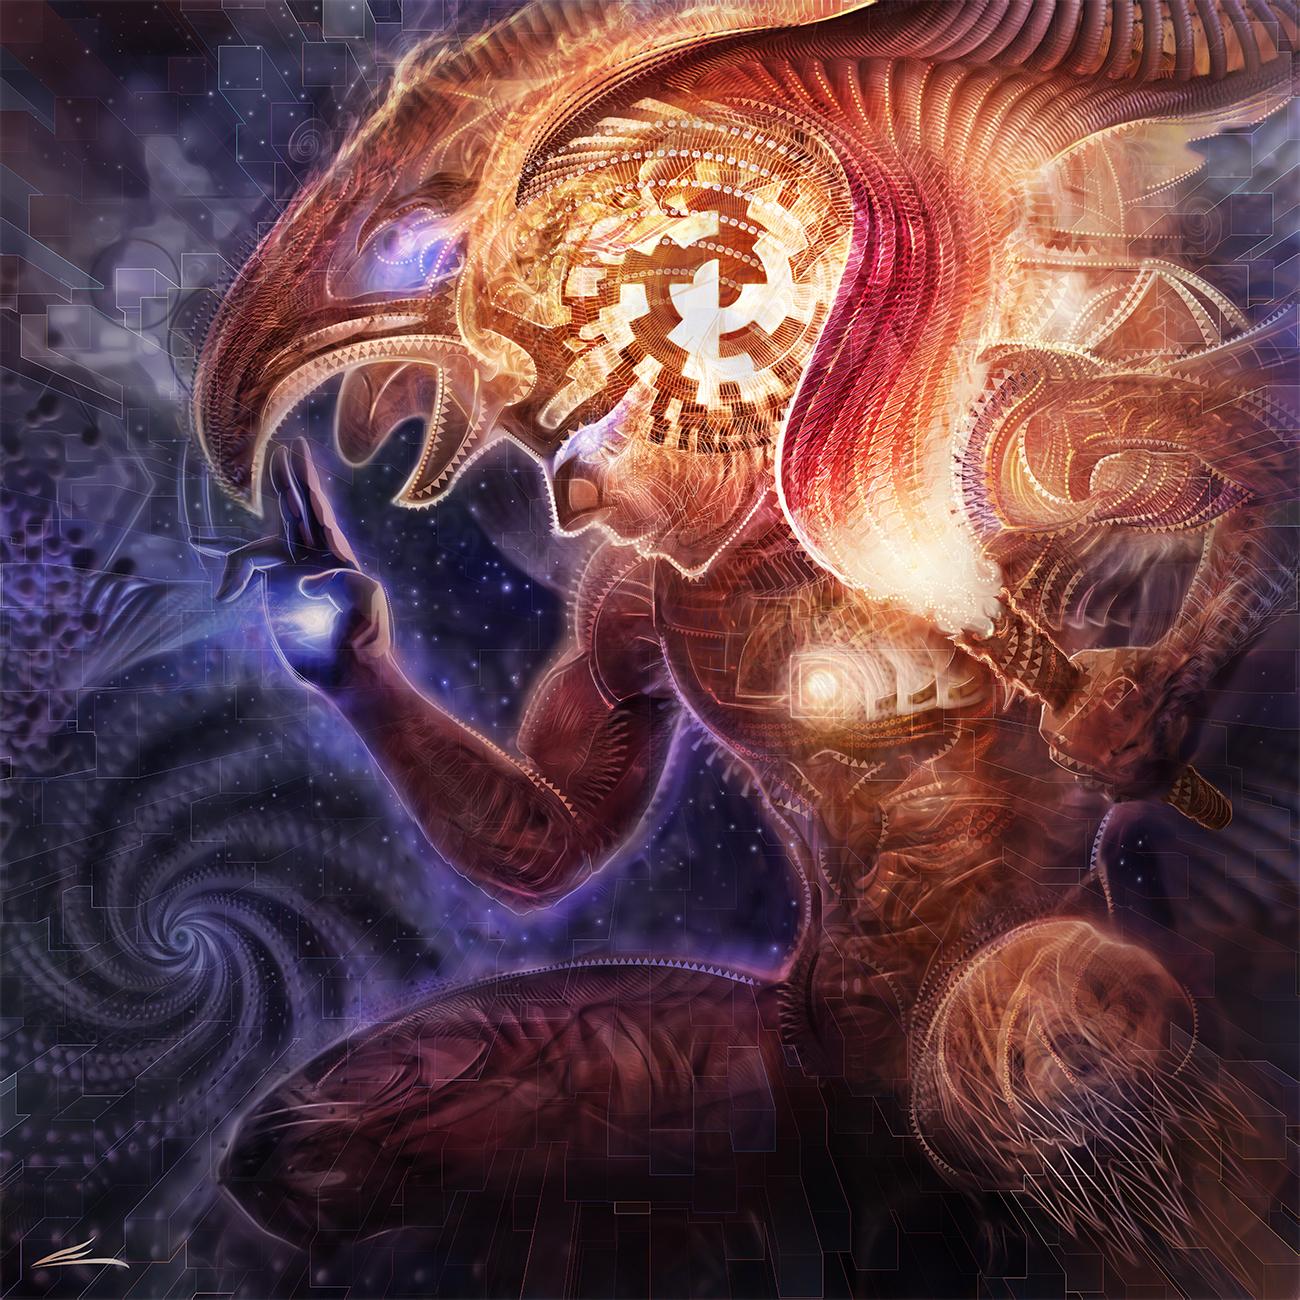 eloh_projects_sean_allum_neolithic_man_10-8-2016